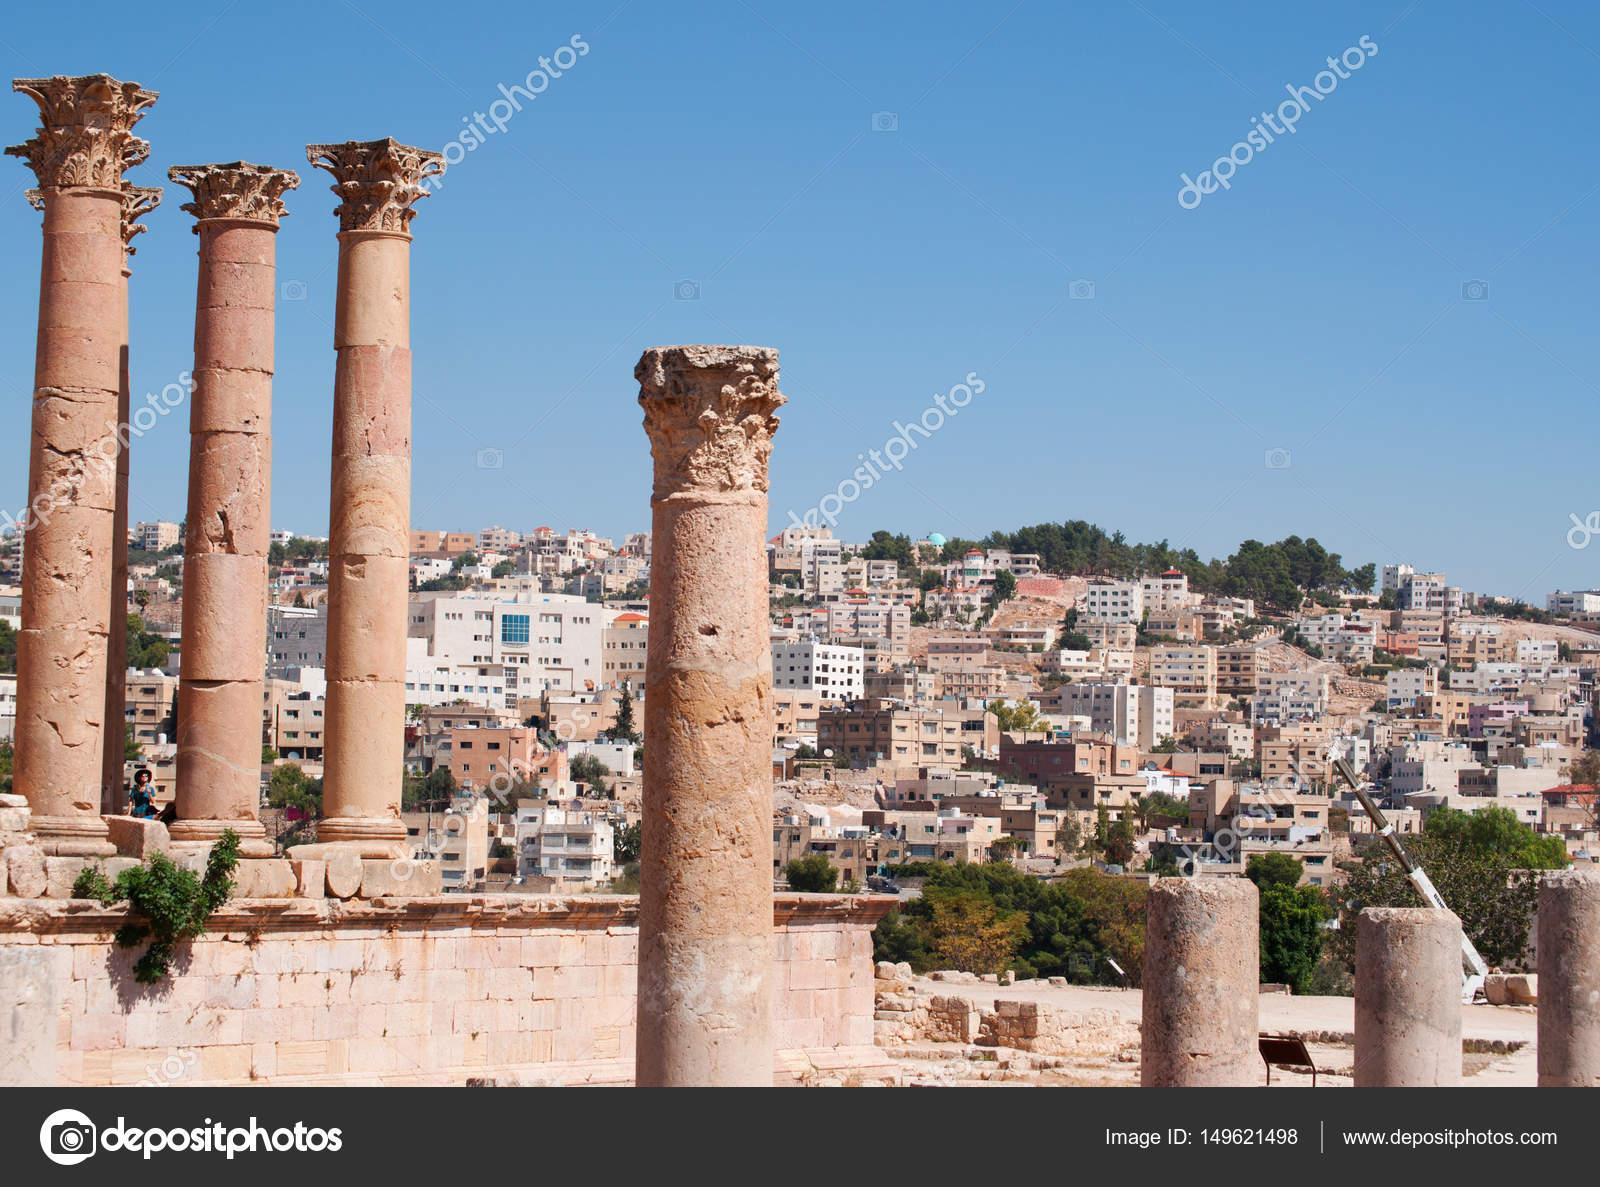 jordan the corinthian columns of the temple of artemis in the